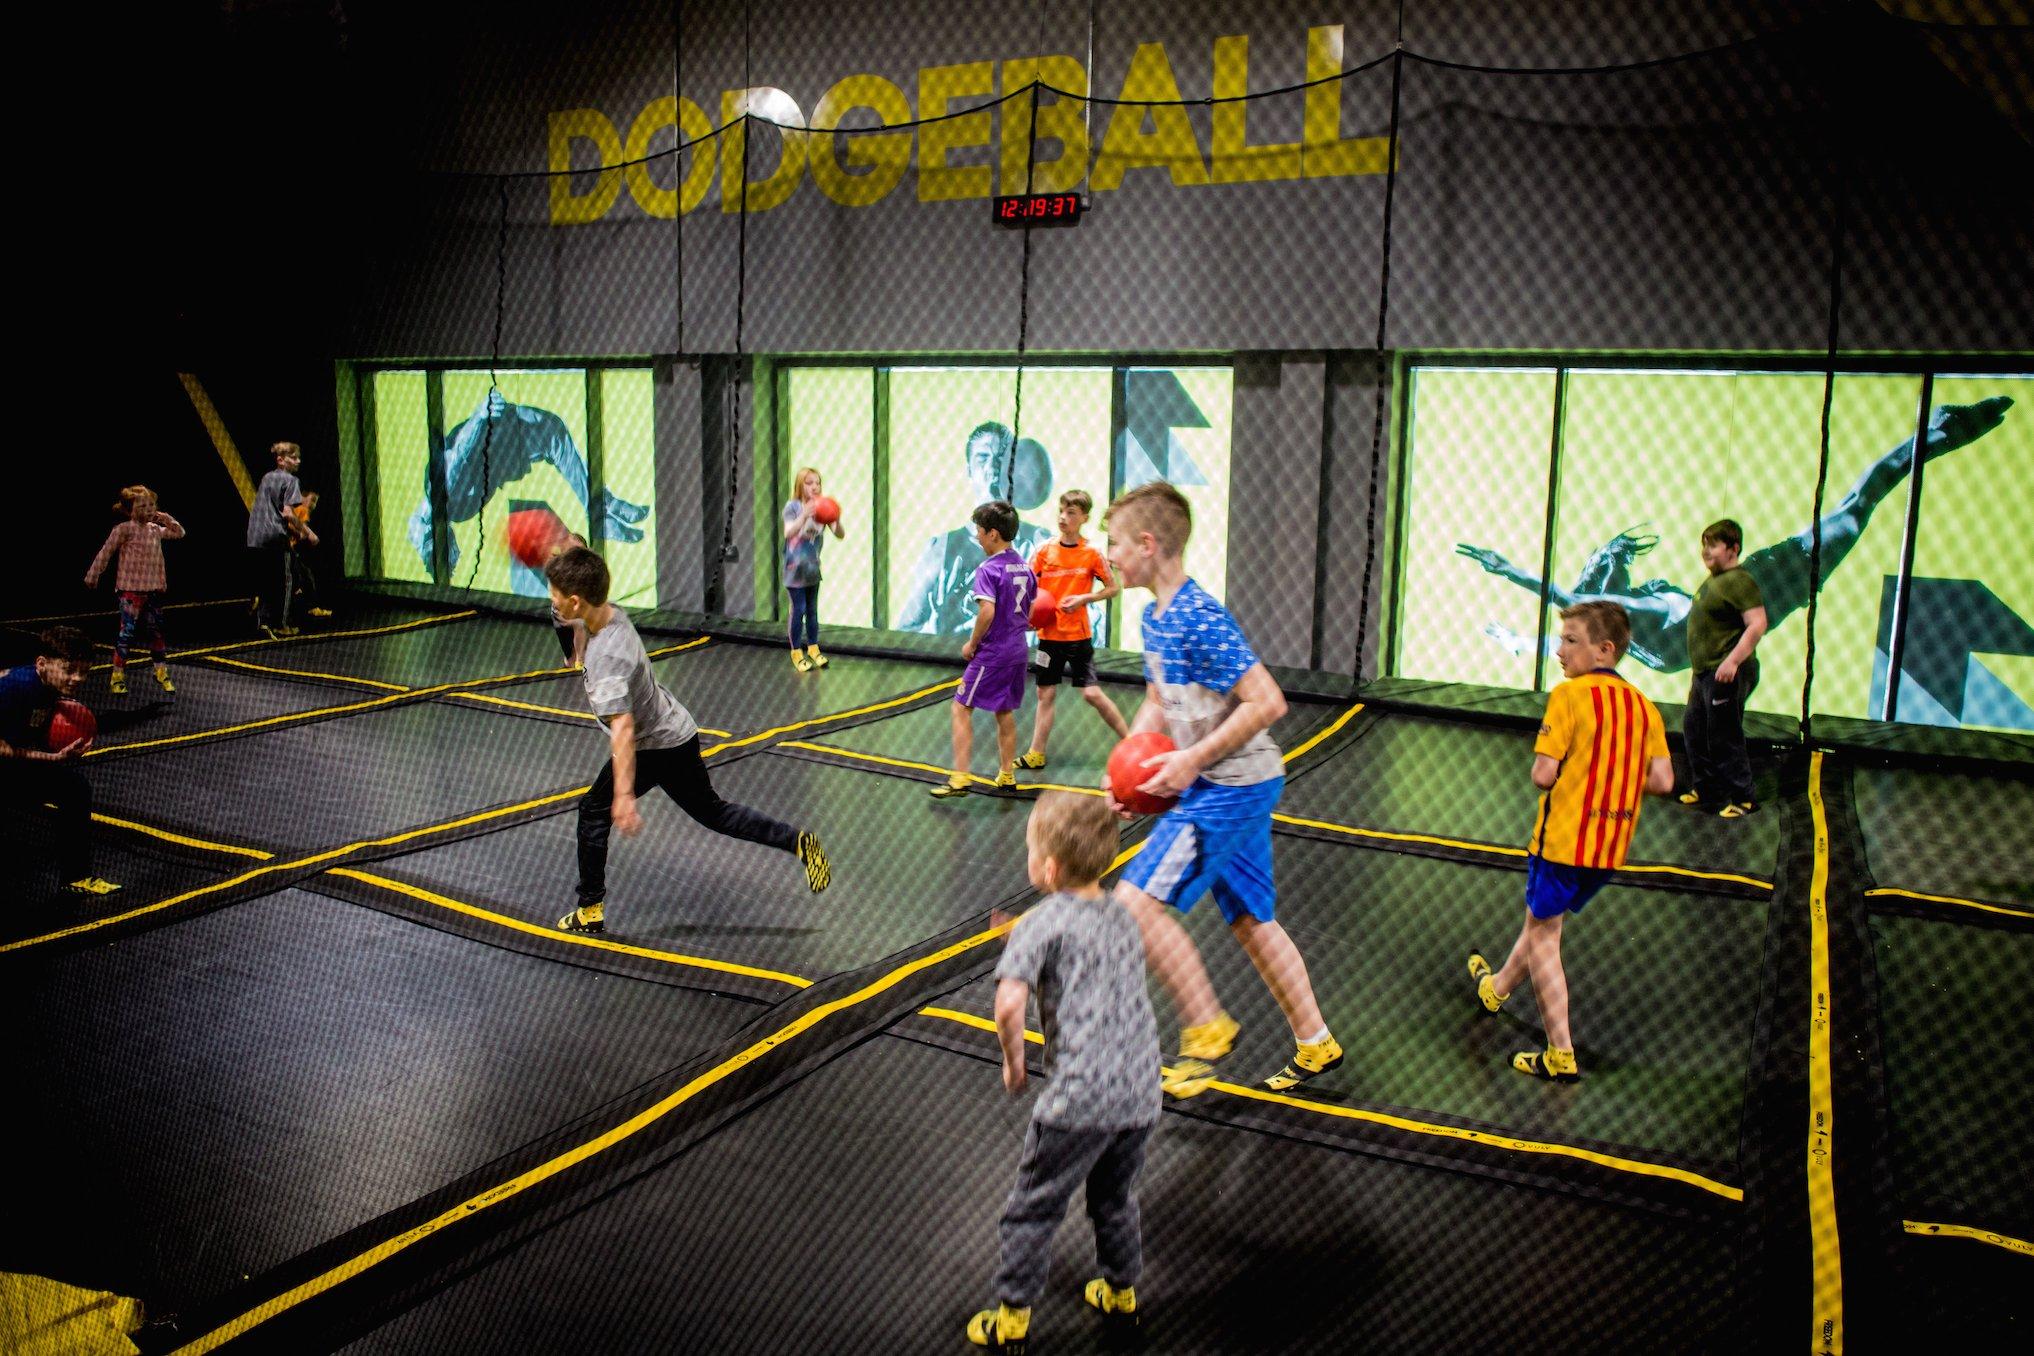 Freedome Dodgeball